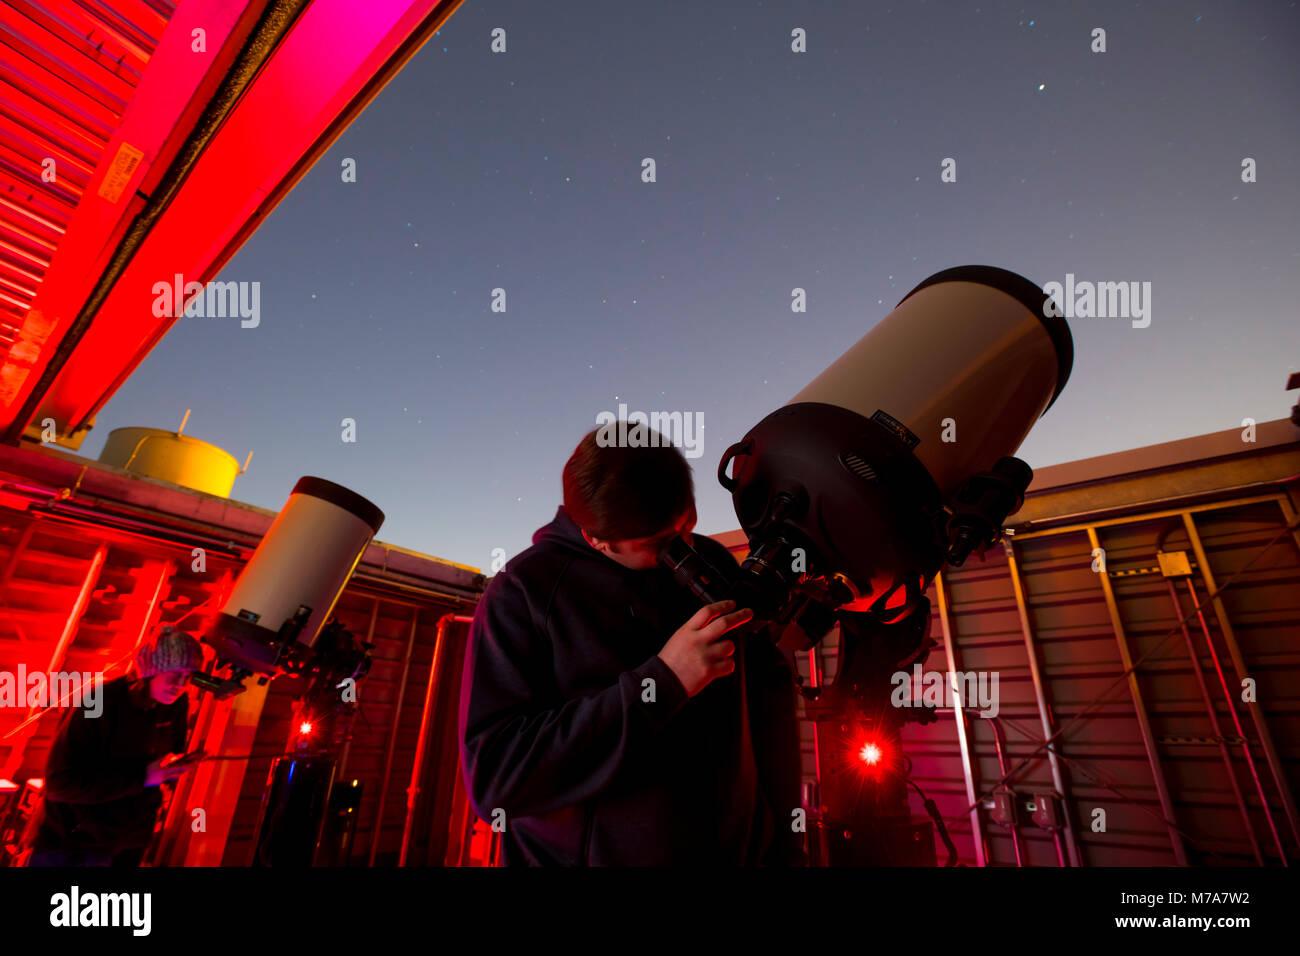 amateur-star-gazing-at-montgomery-colleg